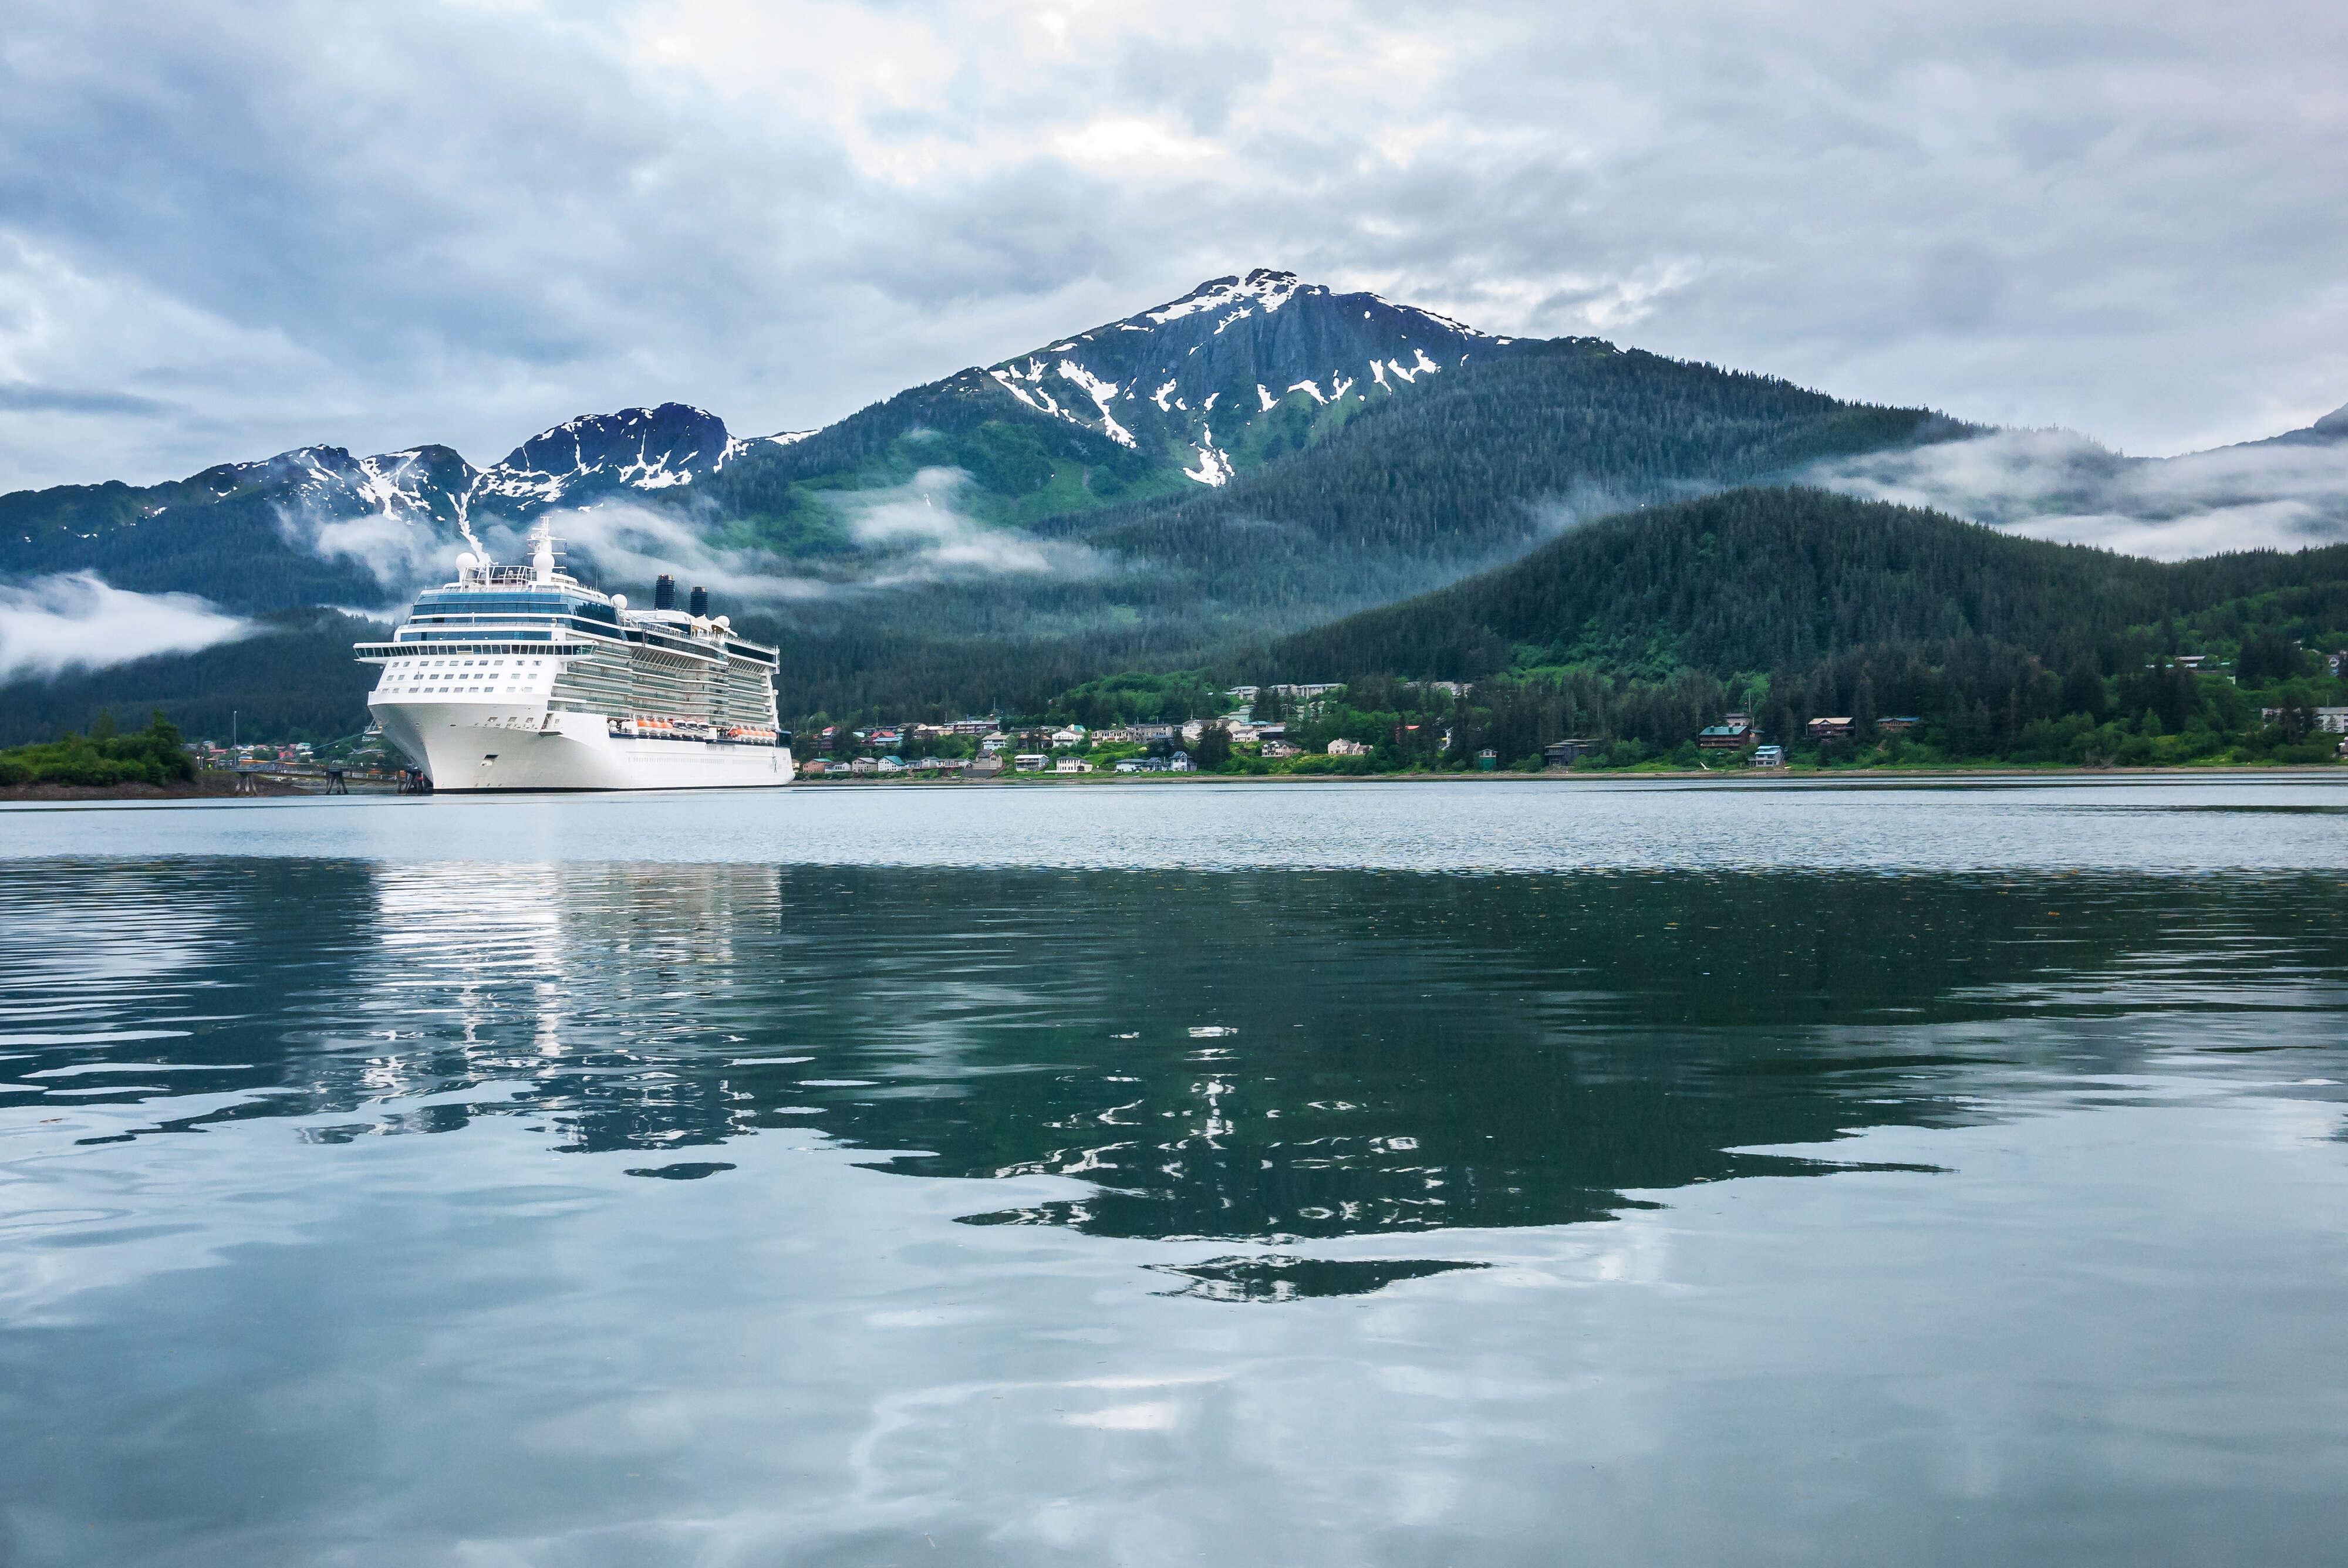 Adventure to Alaska featuring a 7-night Royal Caribbean Cruise